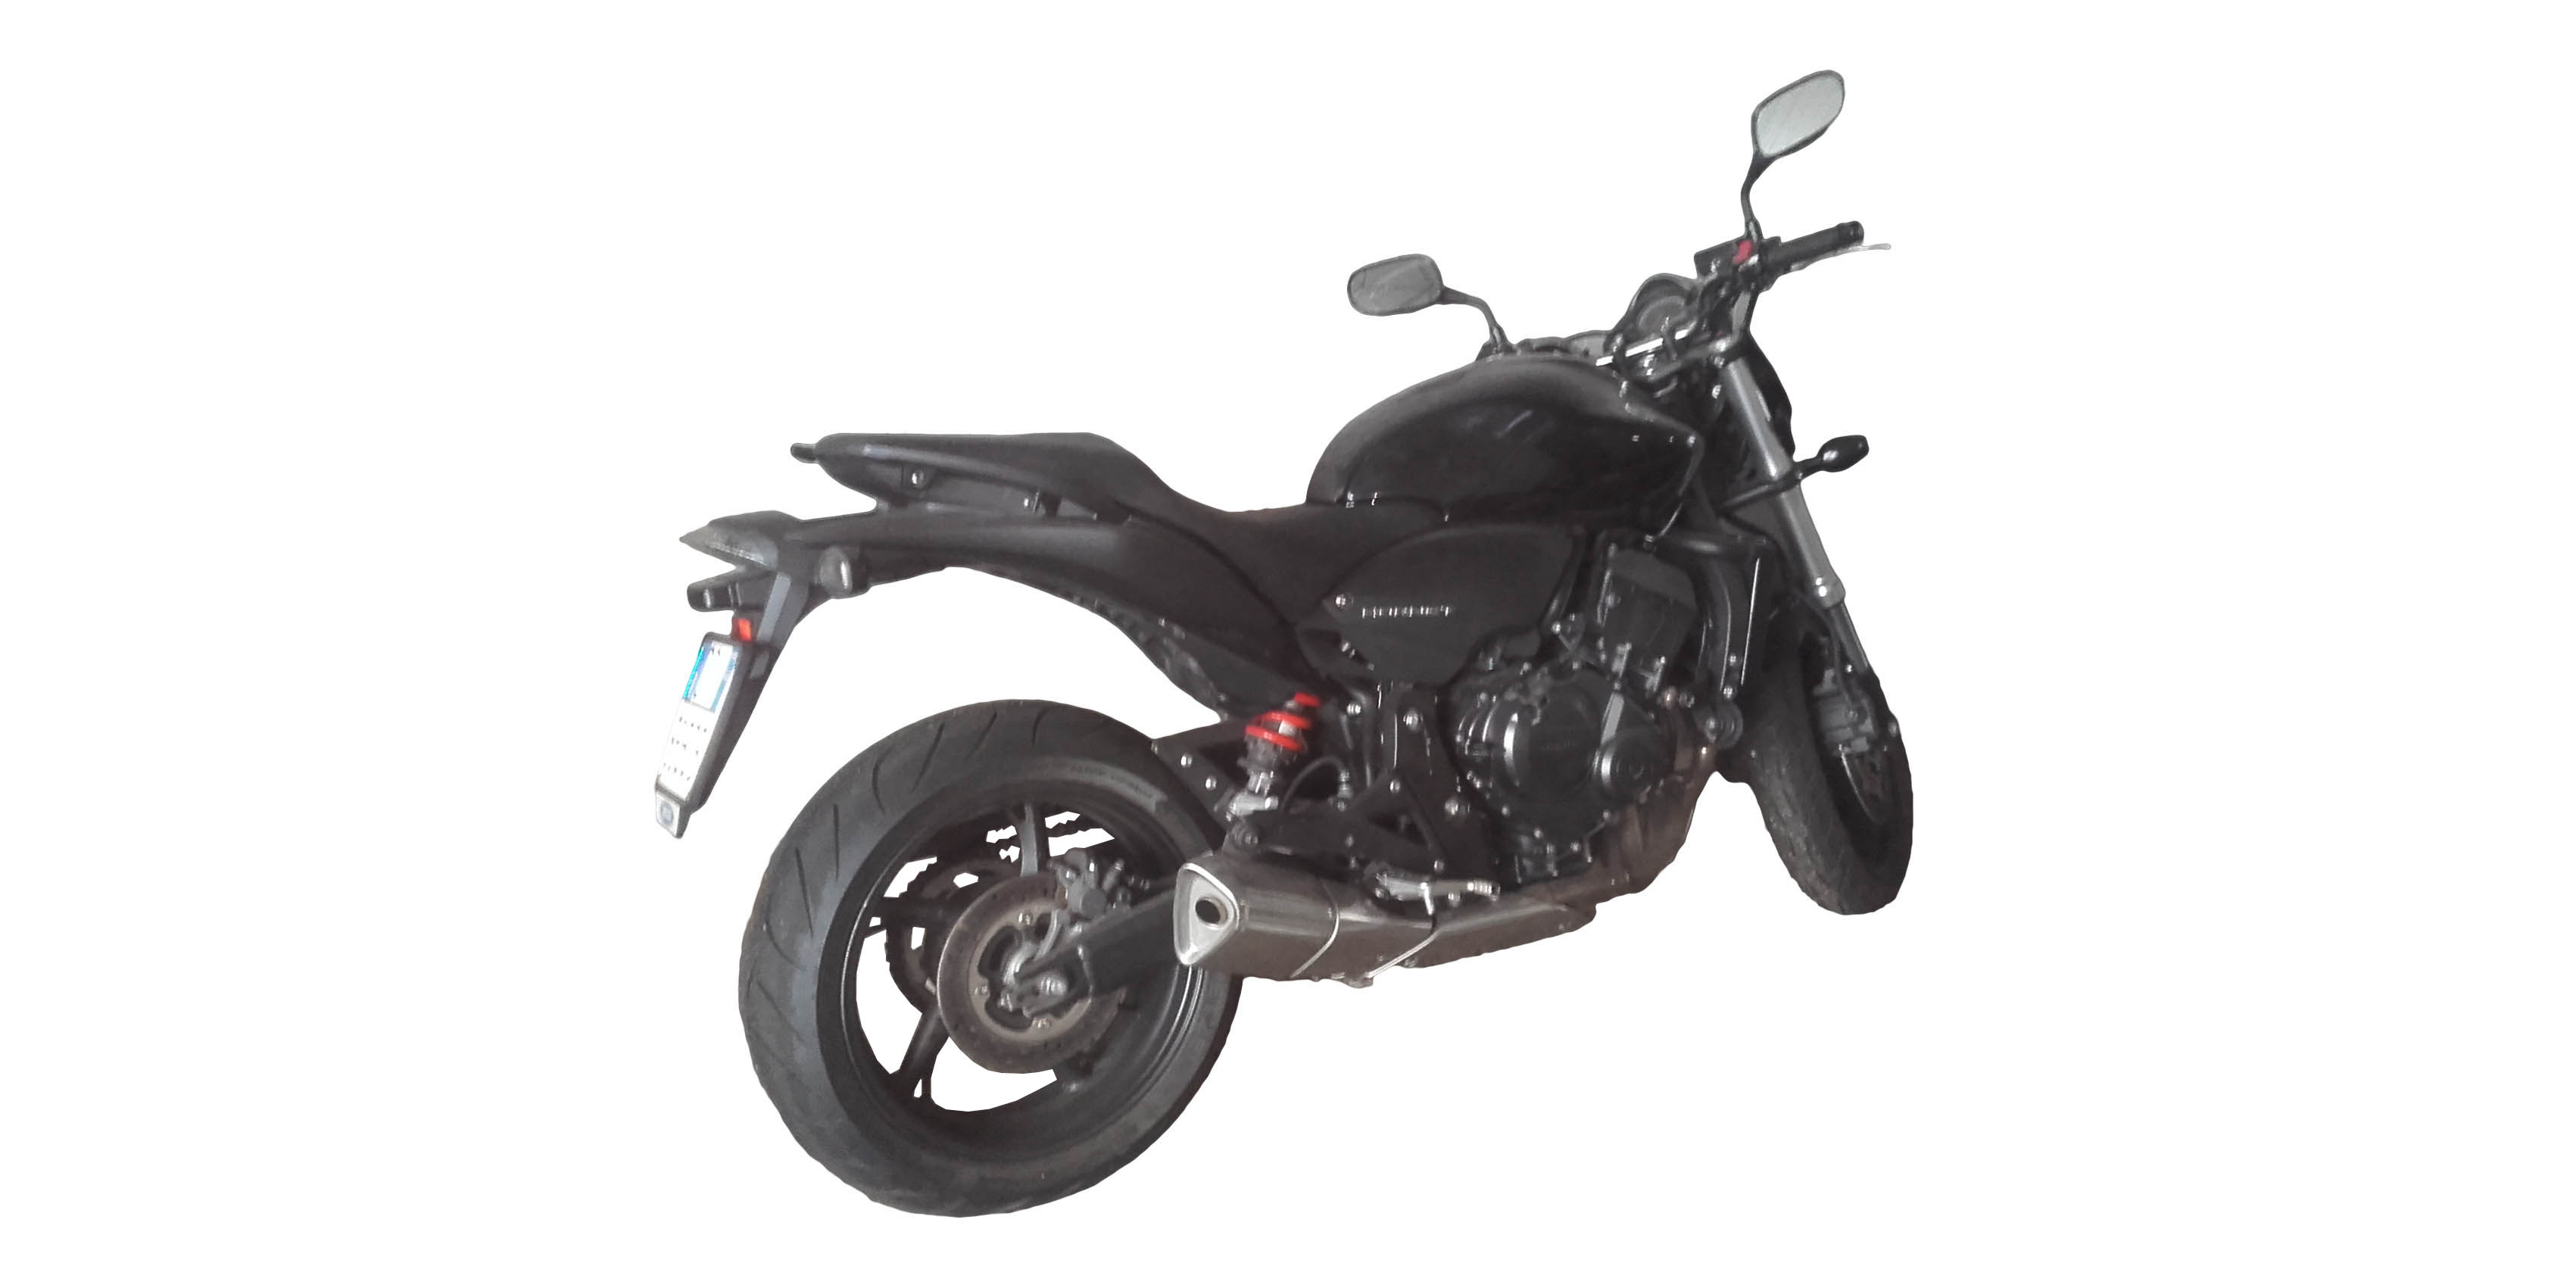 Honda Hornet cc 600 da 70 Kw